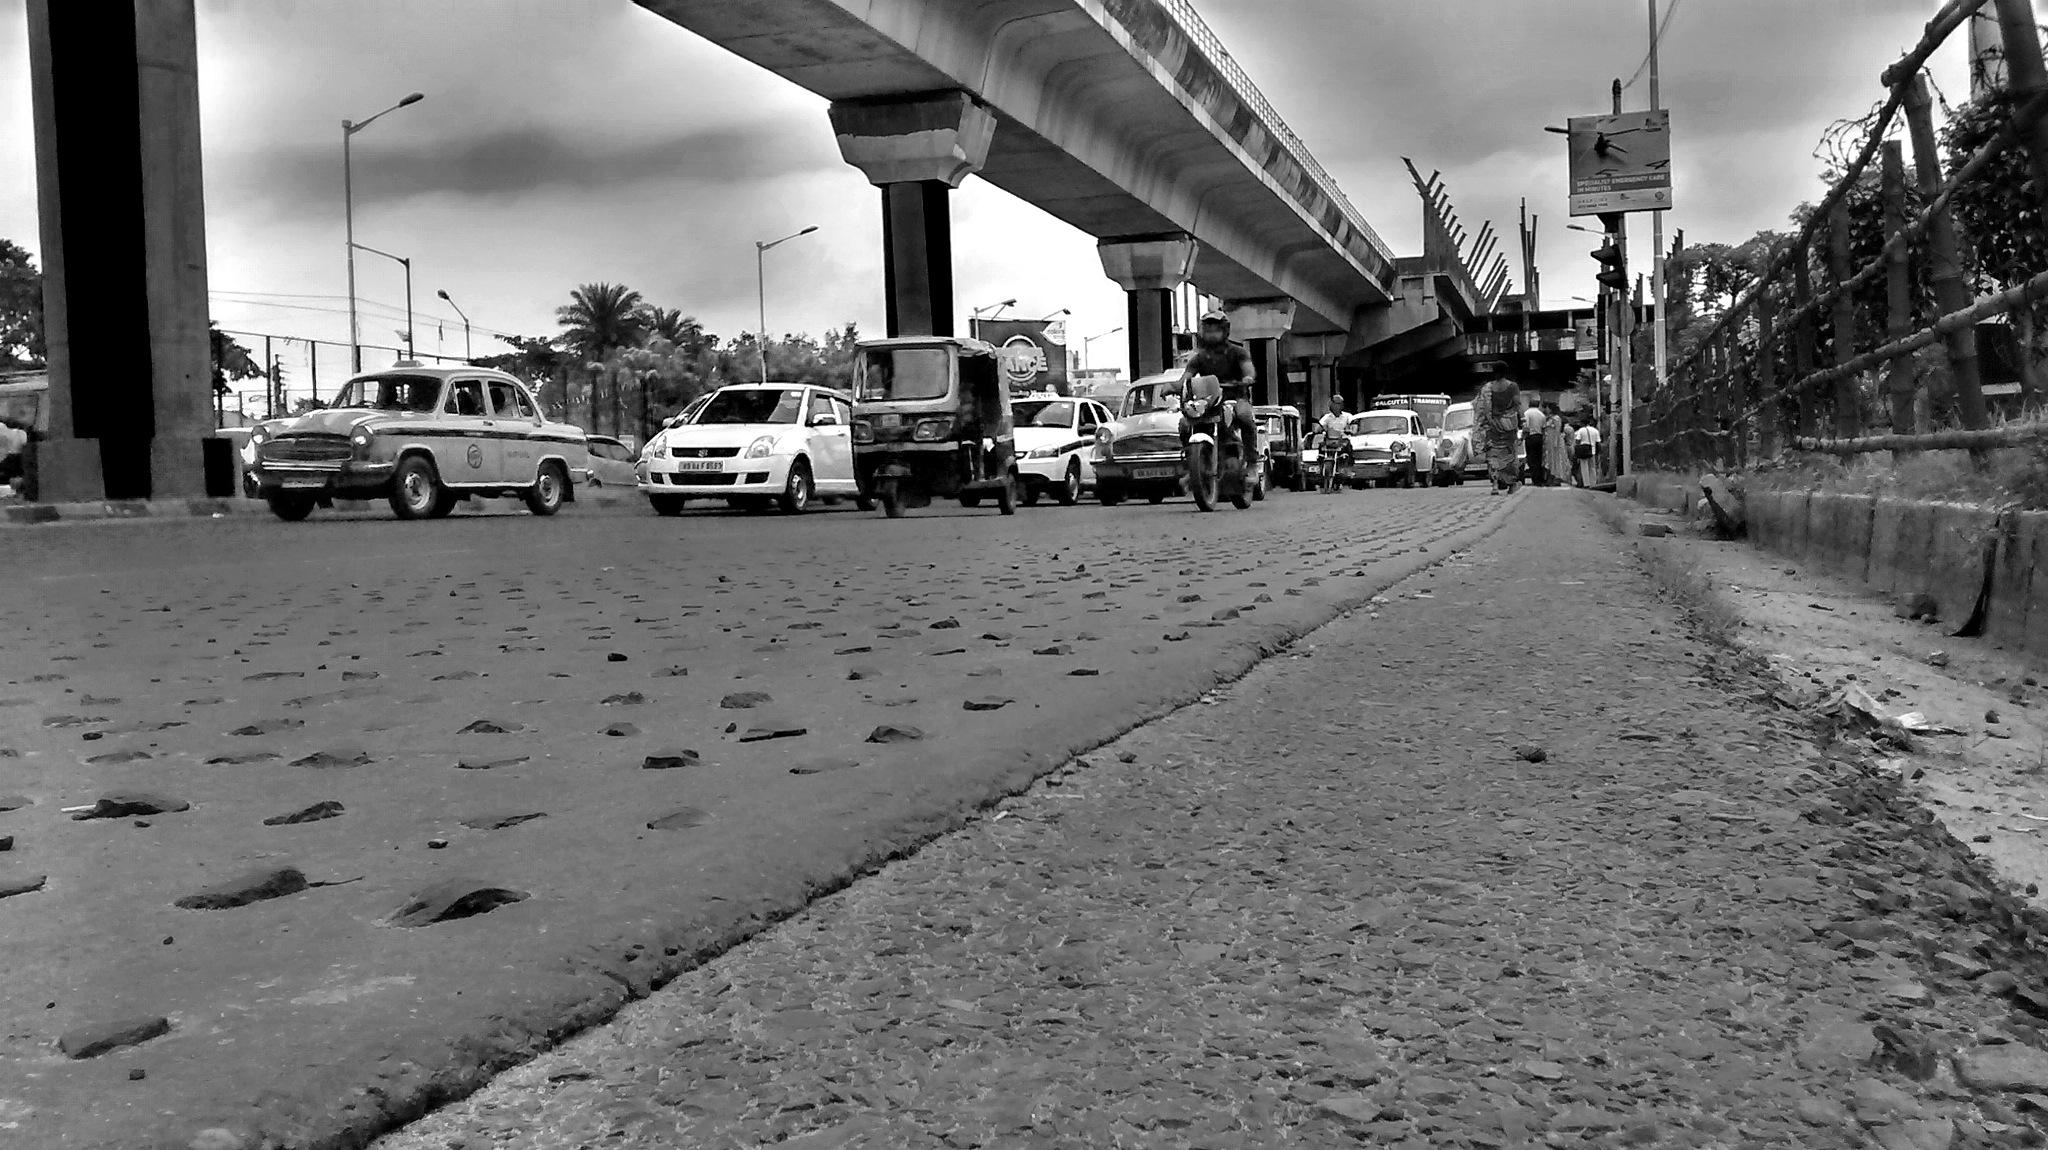 Street view  by Soumyadeep Biswas